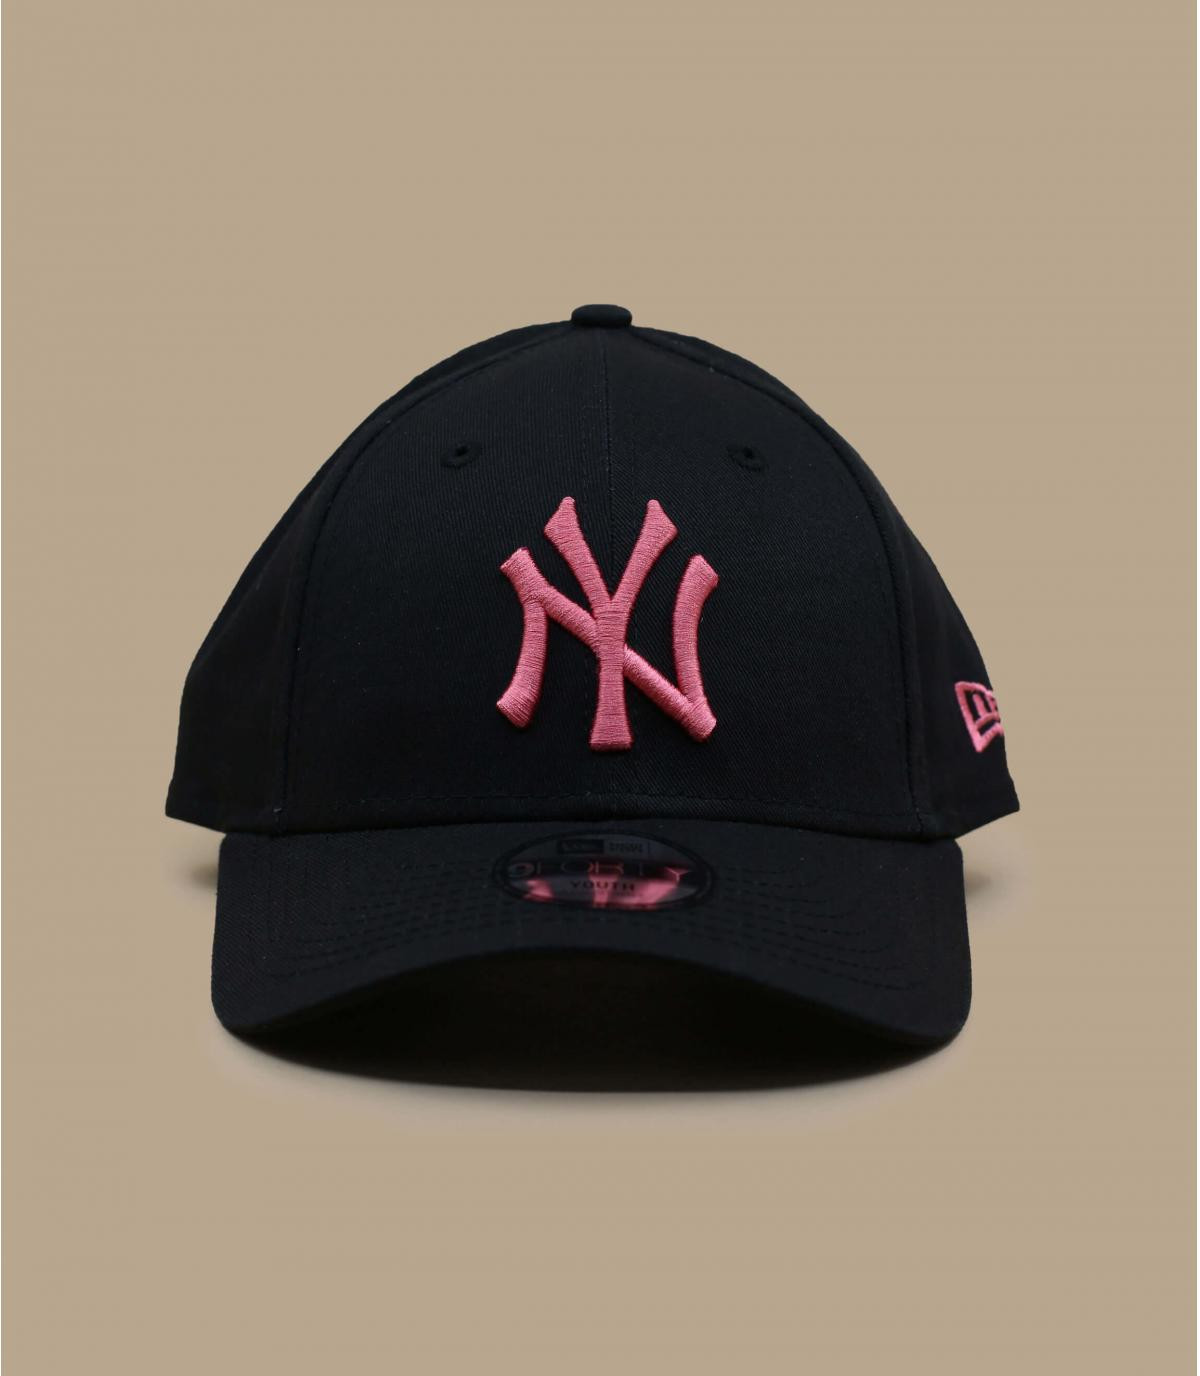 gorra niño negro rosa